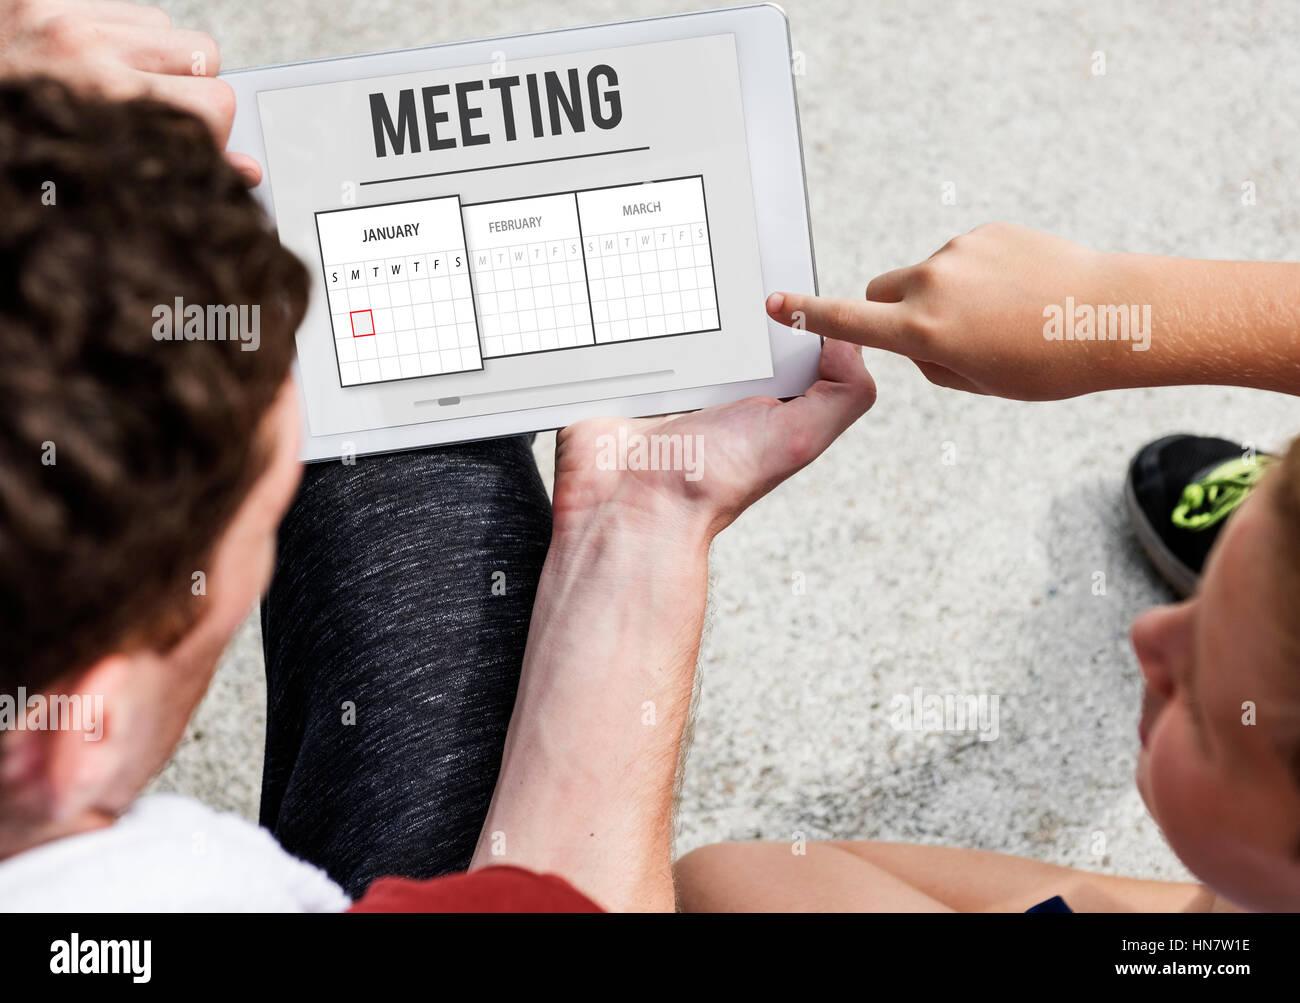 Schedule Agenda Planner Reminder Concept - Stock Image